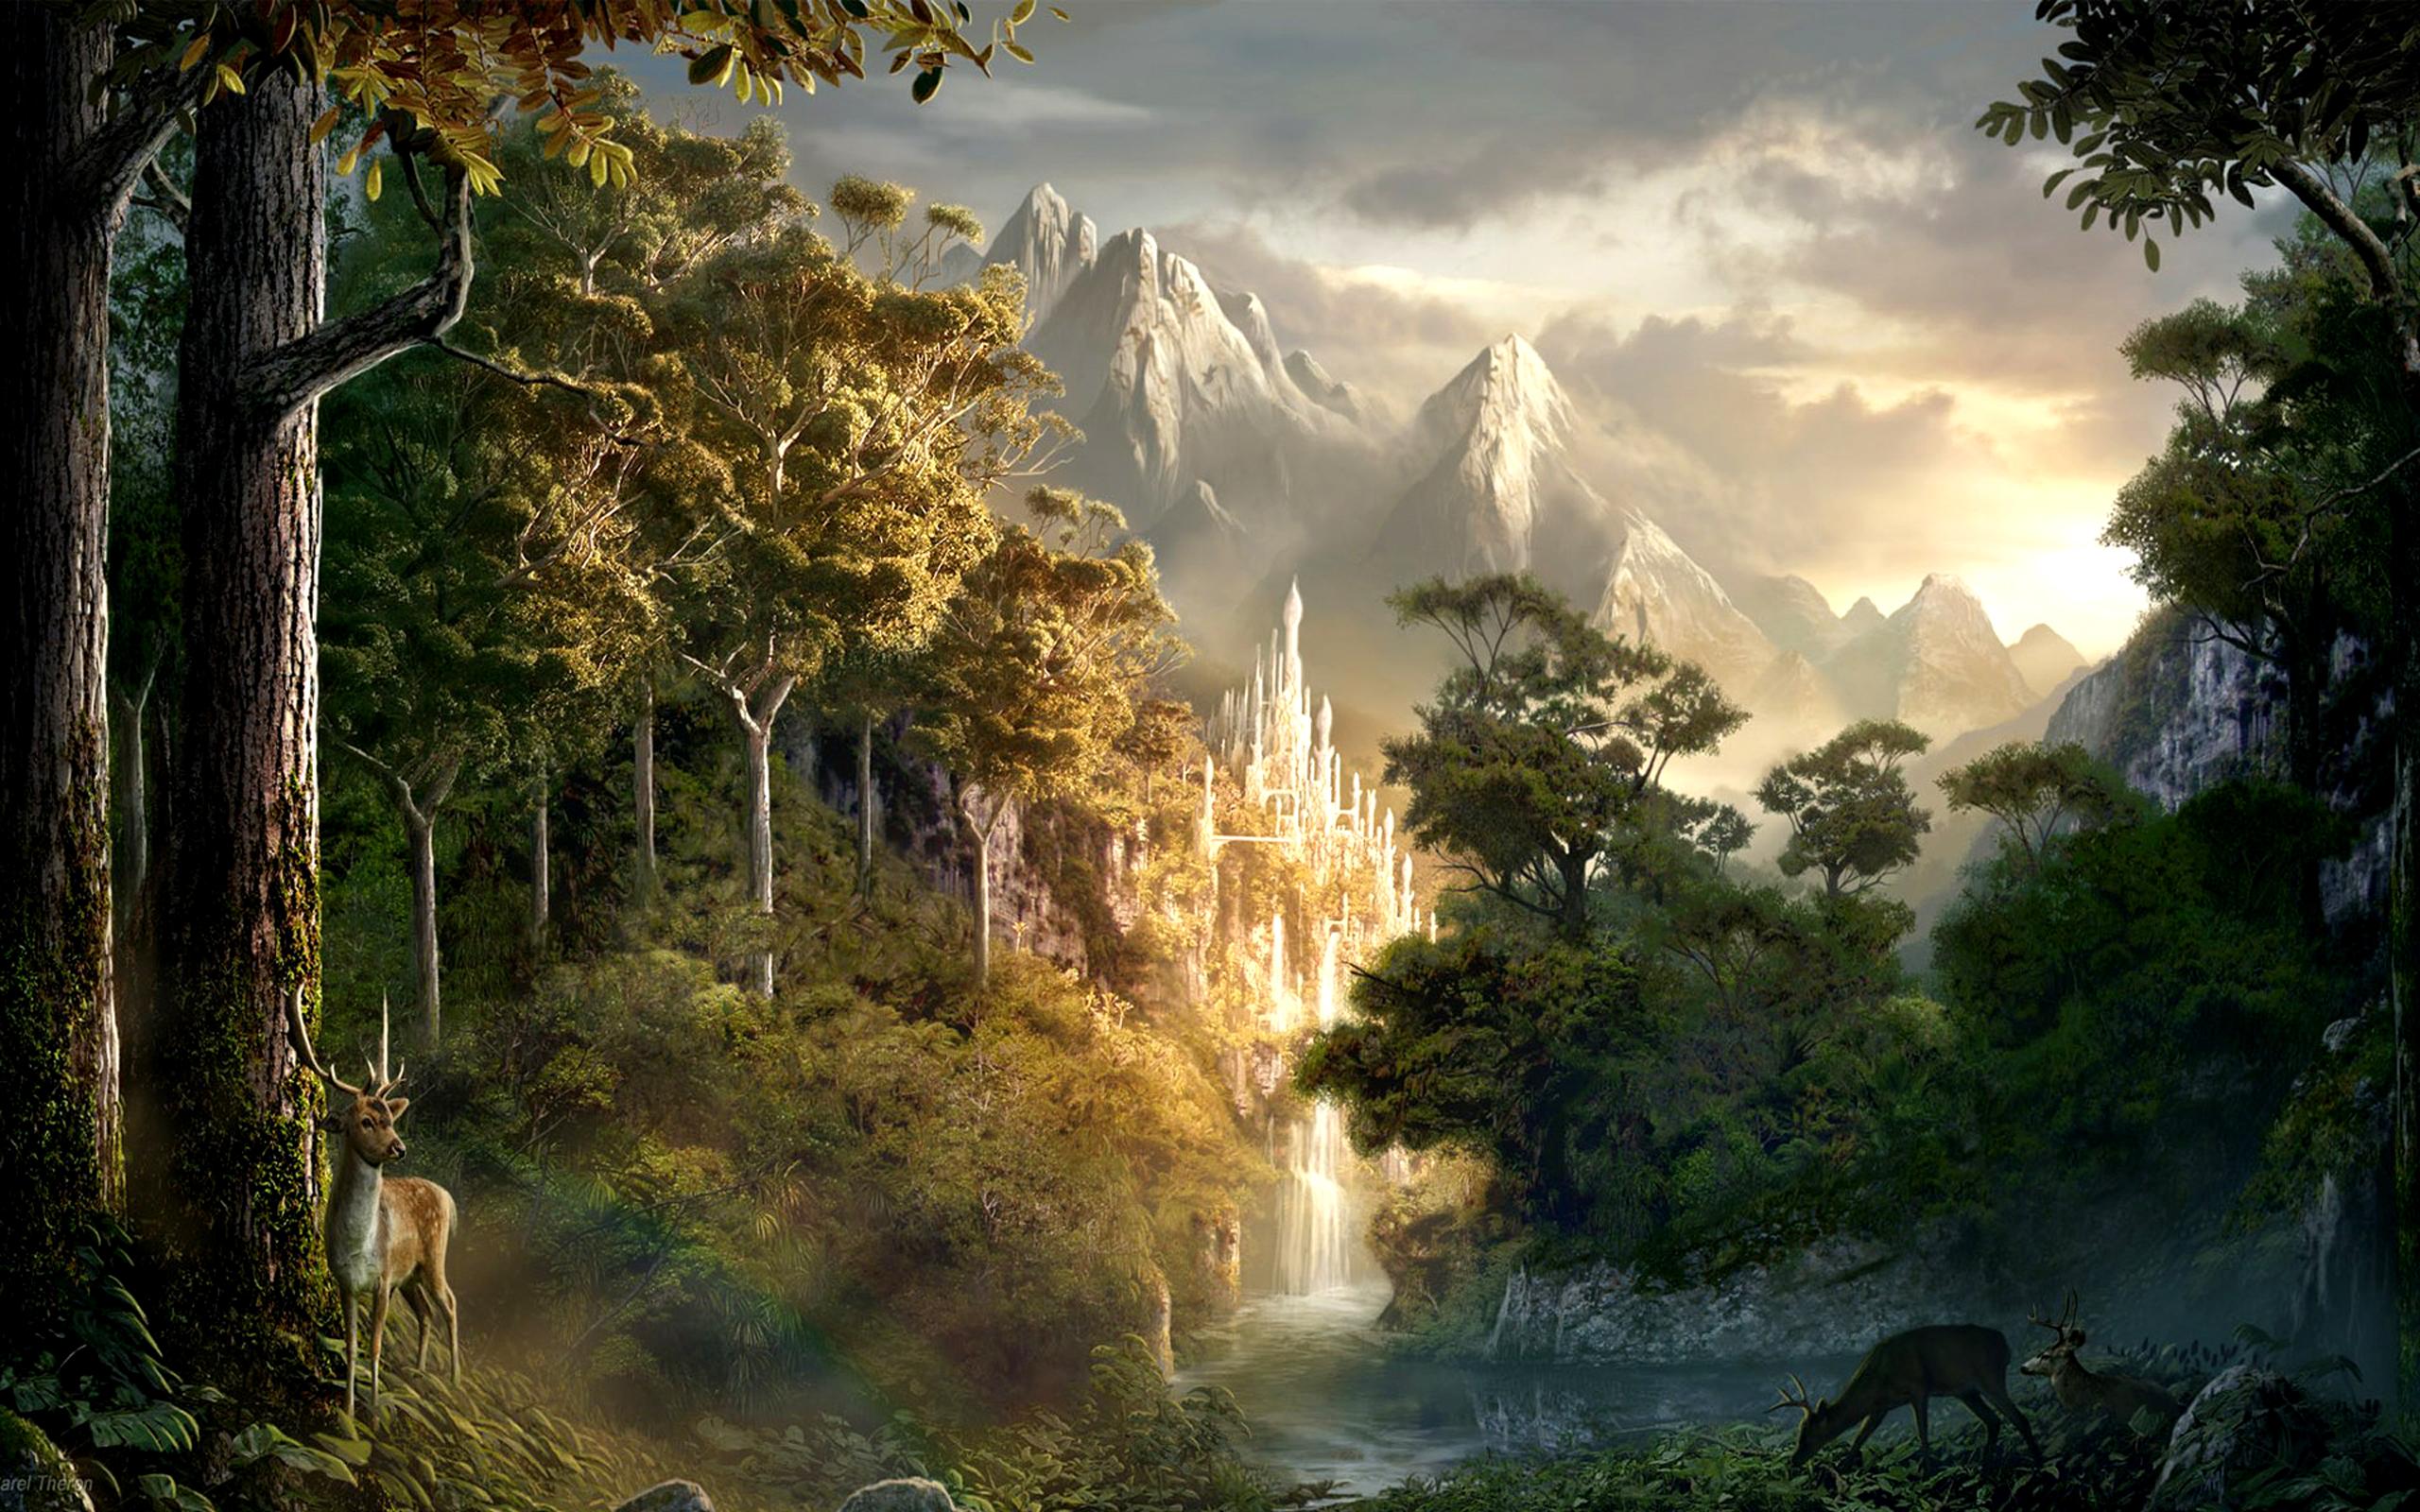 fantasy landscape wallpaper  1394 Landscape HD Wallpapers | Background Images - Wallpaper Abyss